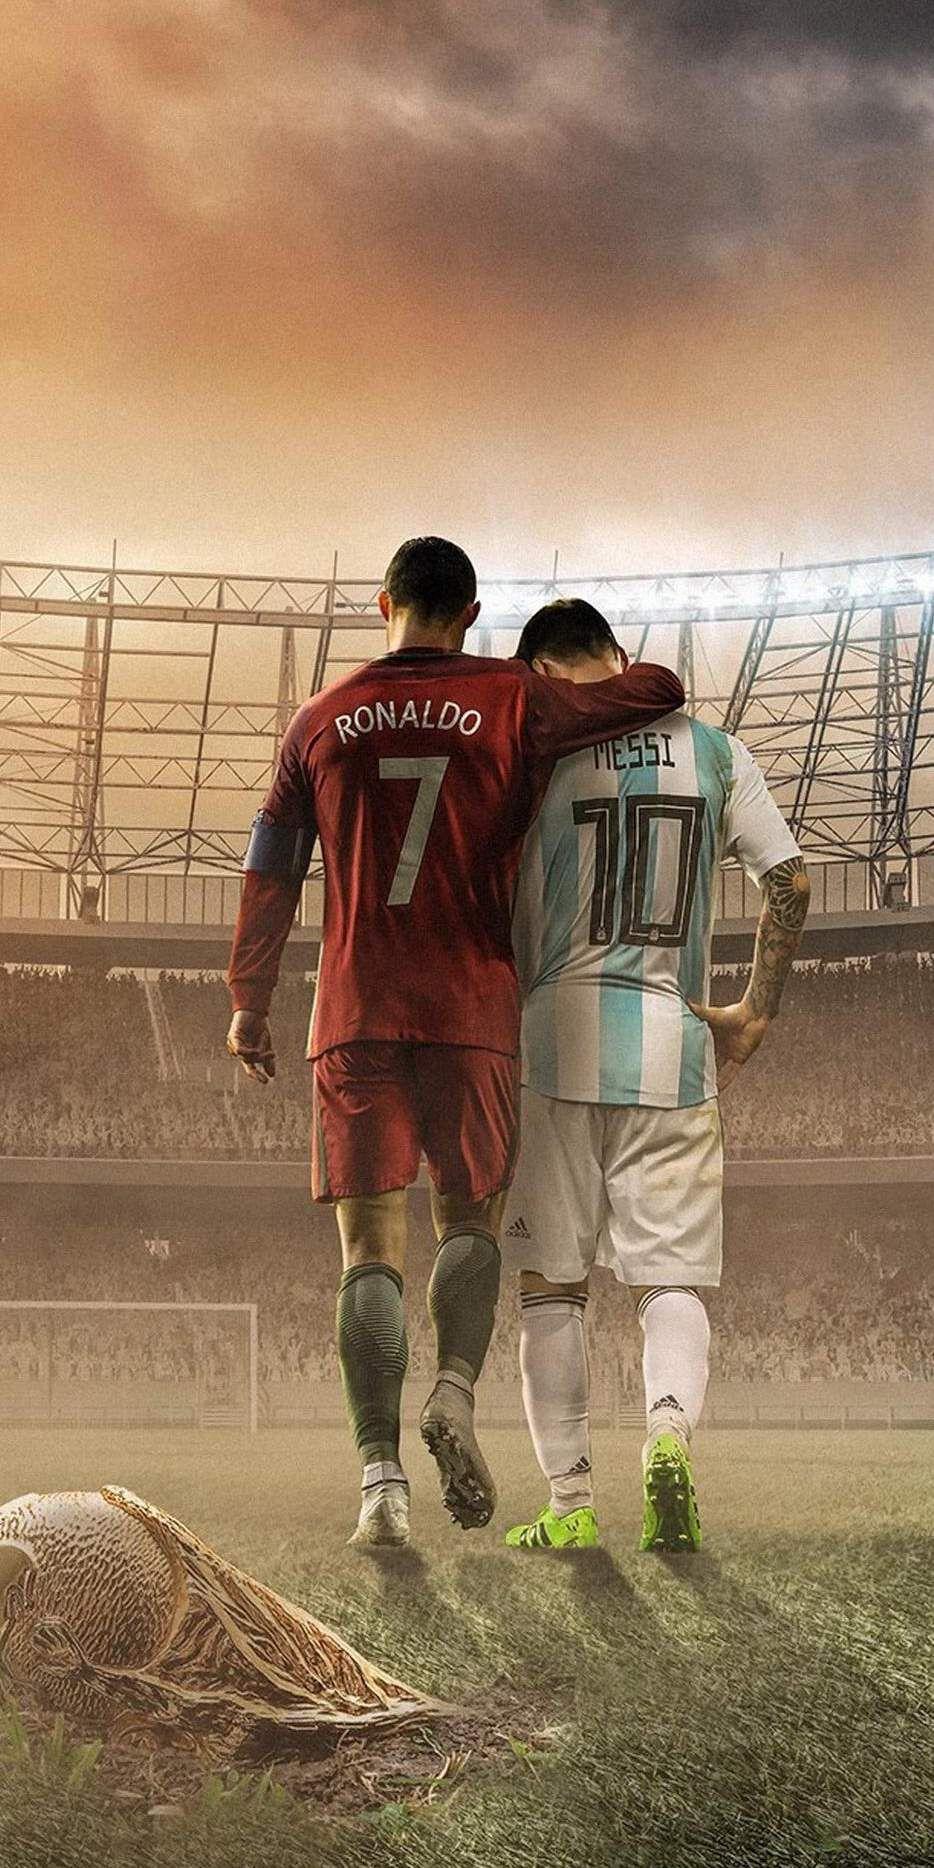 Messi And Ronaldo Football Iphone Wallpaper Ronaldo Football Messi And Ronaldo Ronaldo Wallpapers